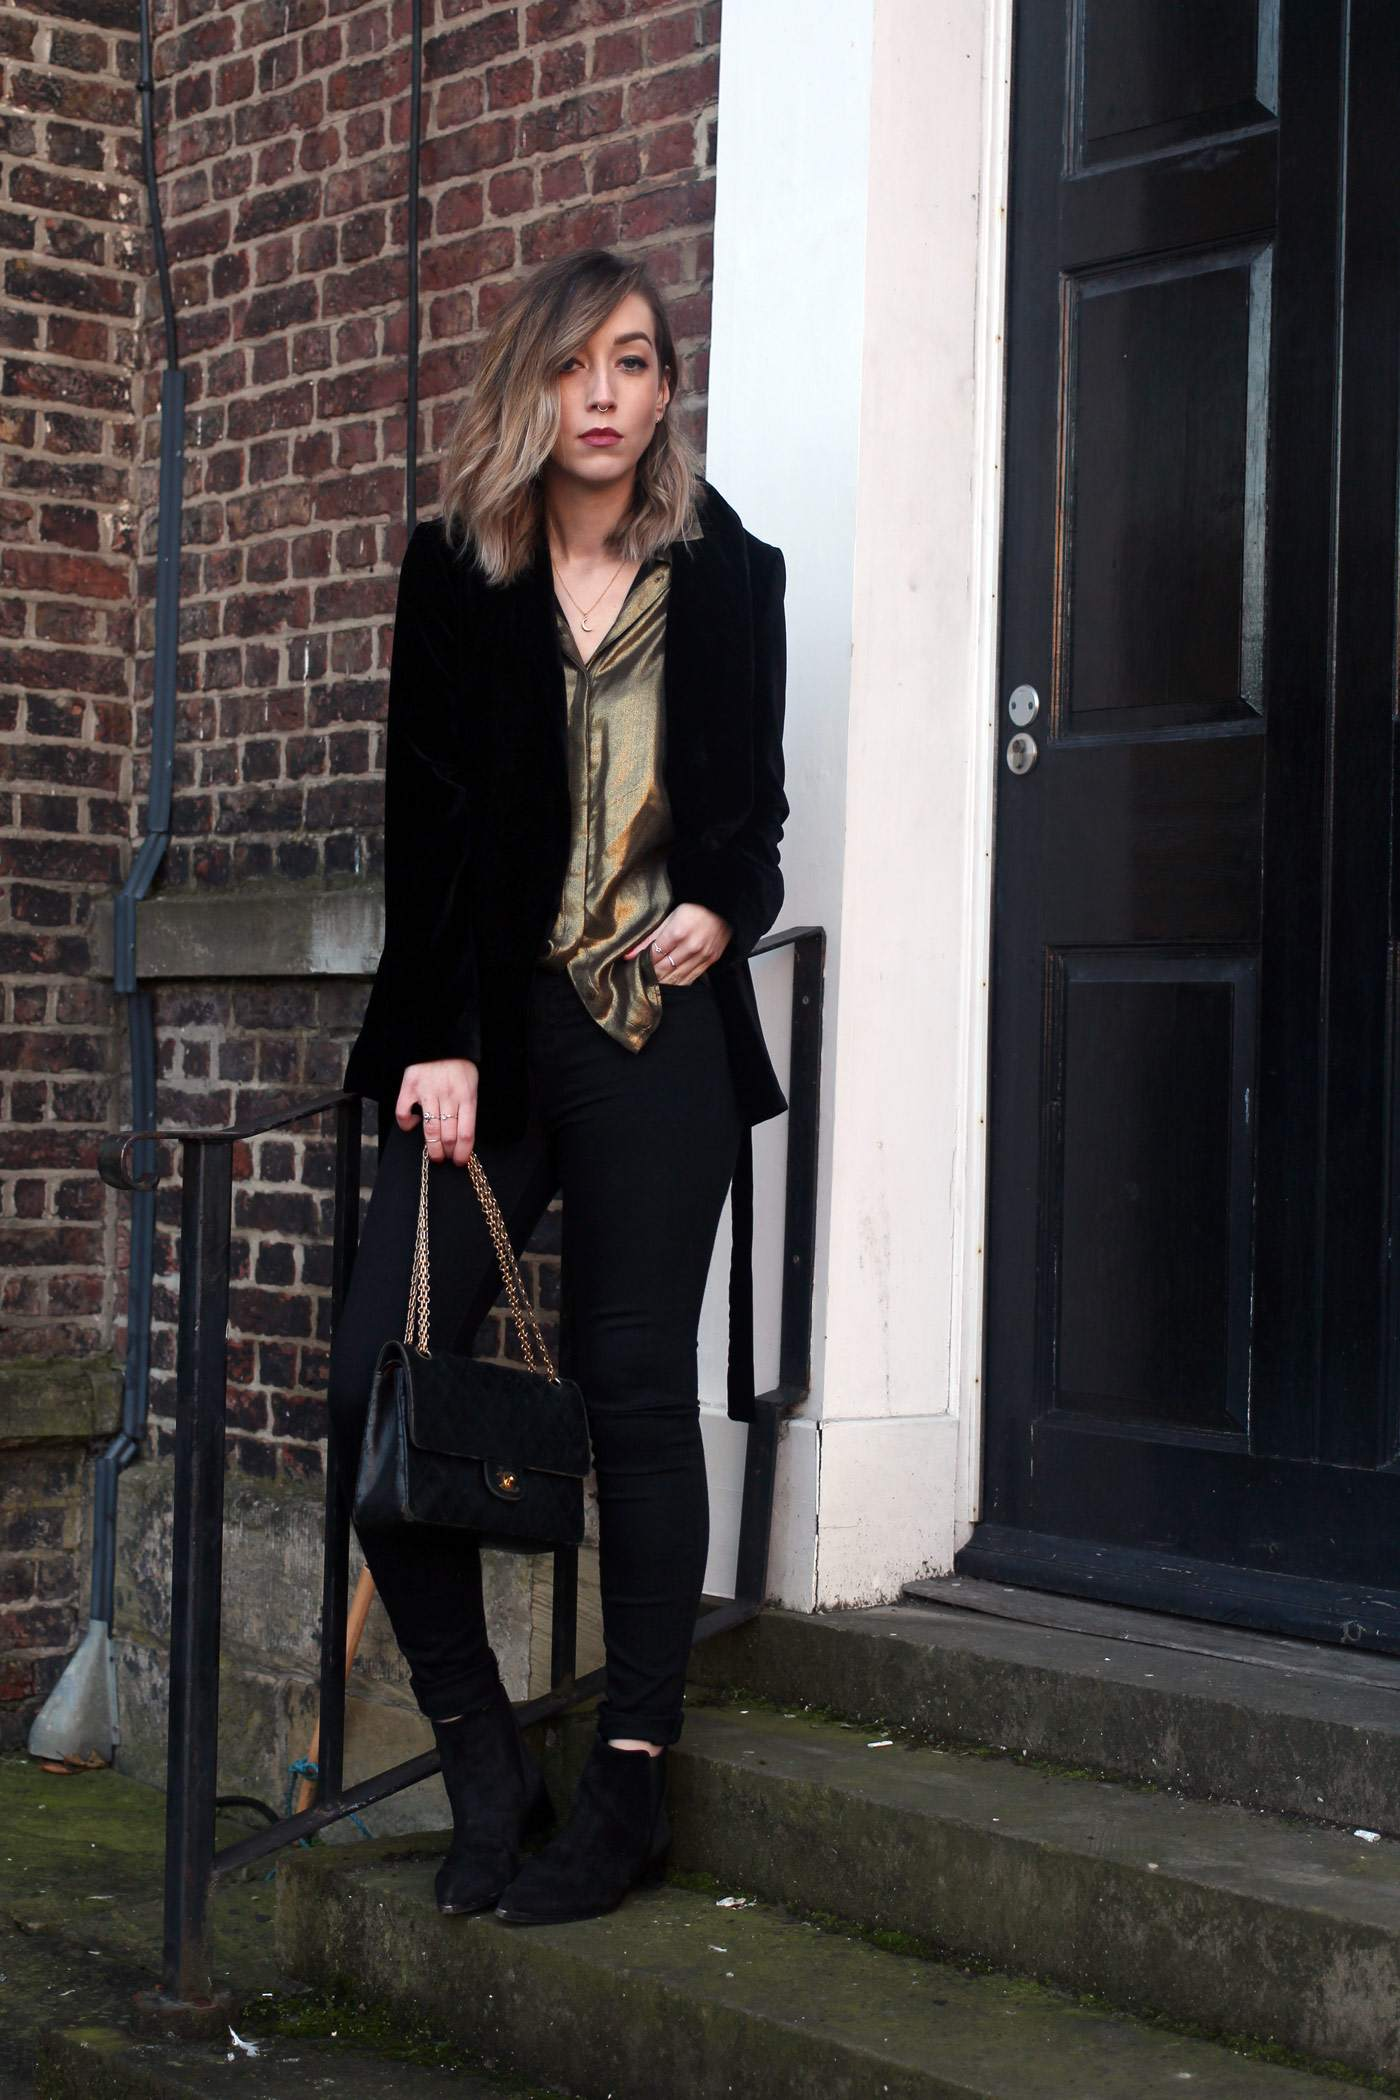 zara-velvet-belted-blazer-gold-shirt-vintage-chanel-acne-jensen-2